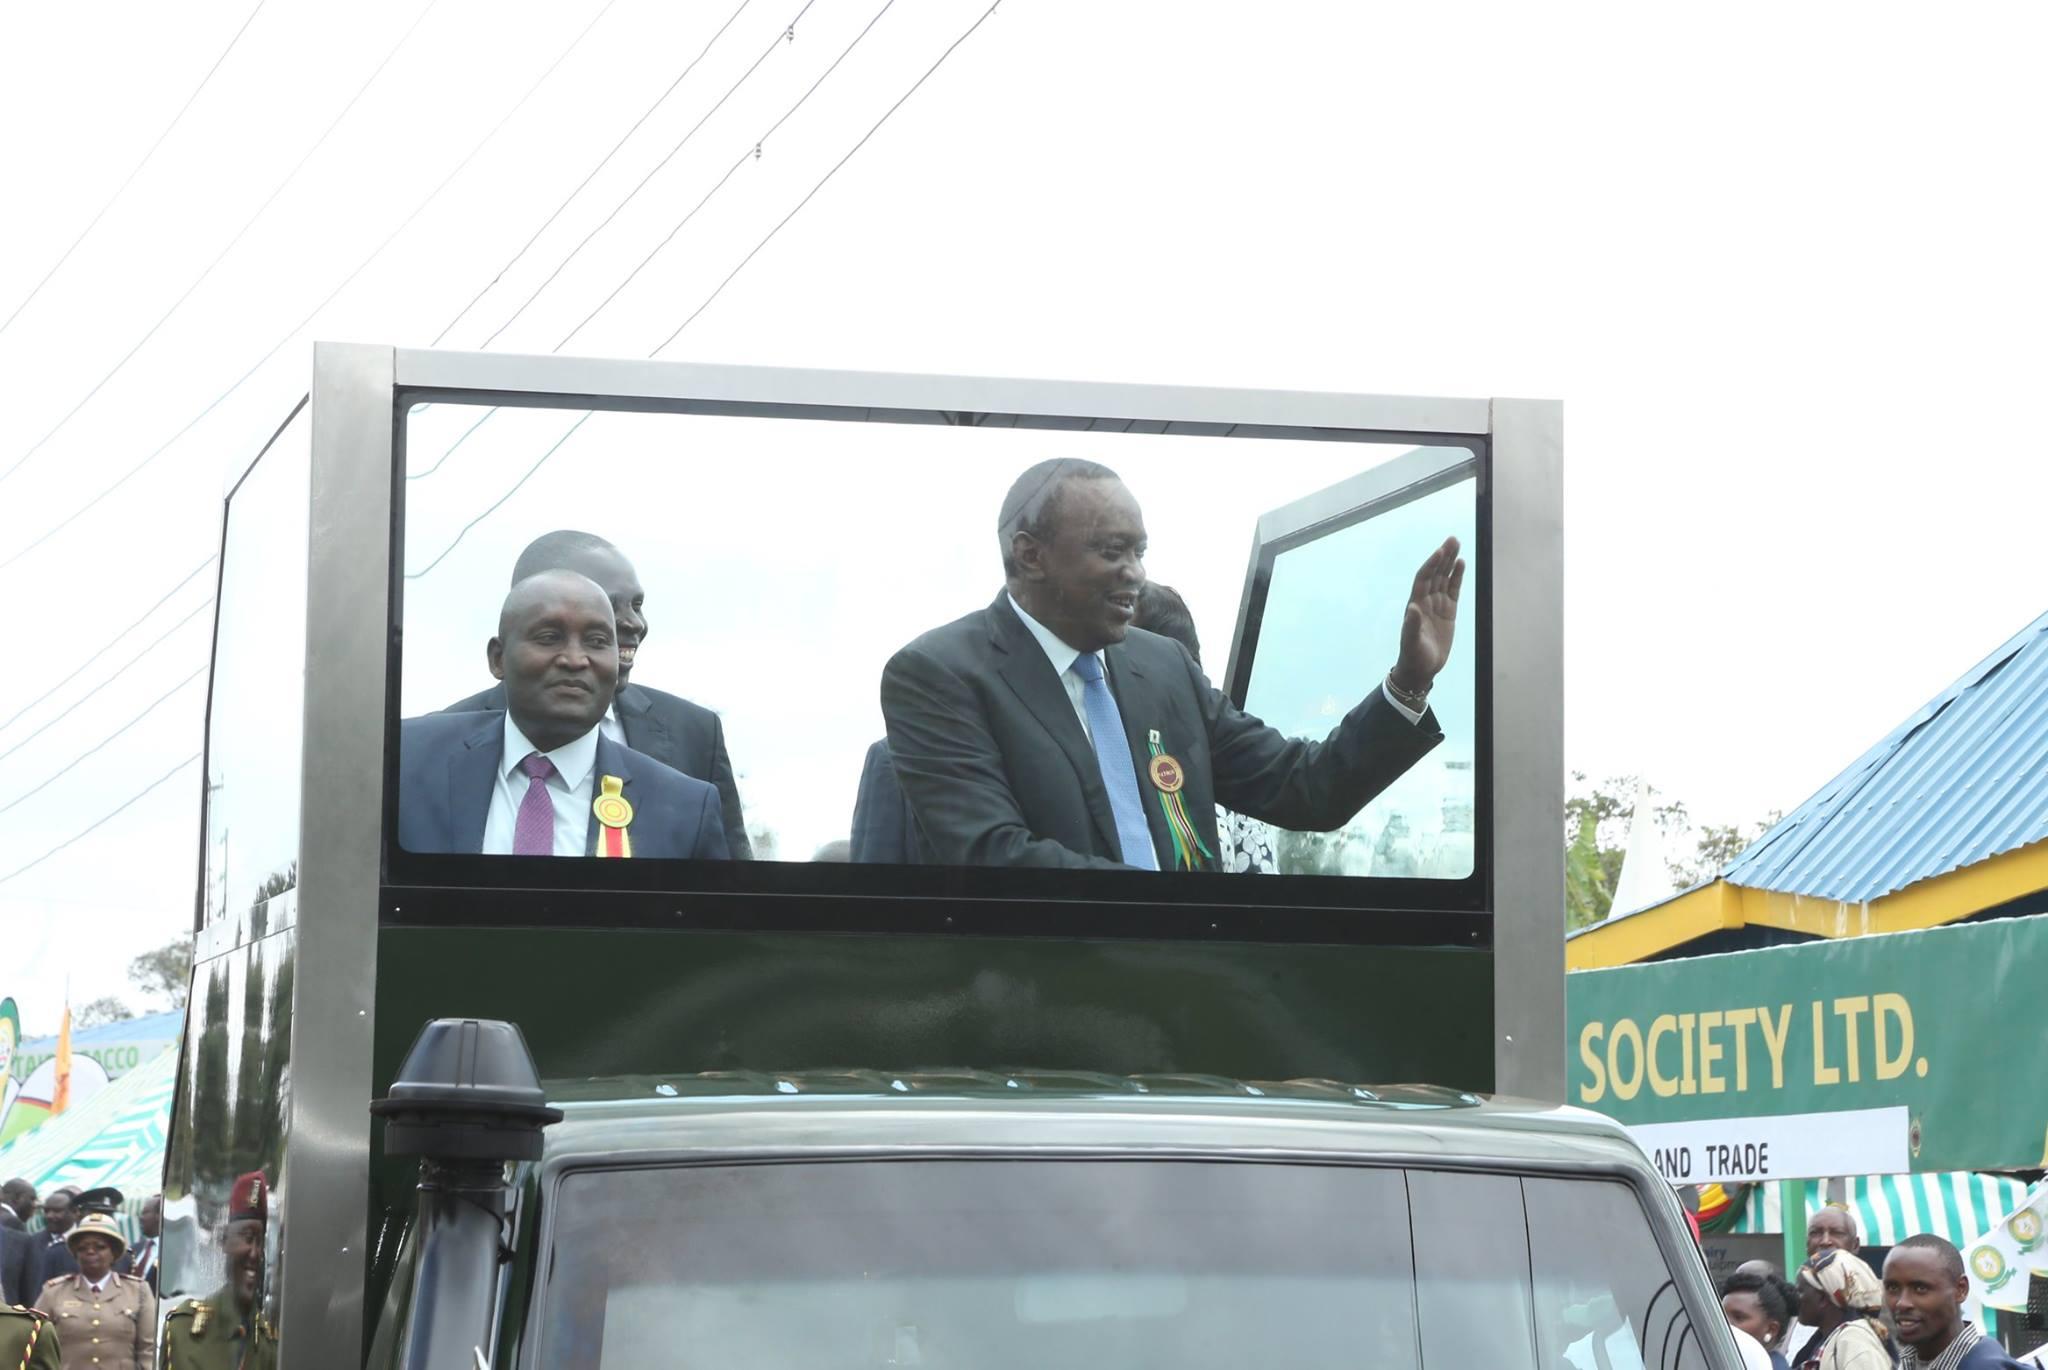 President Uhuru Kenyatta with the late governot Wahome Gakuru. photo credit: Facebook/Uhuru Kenyatta